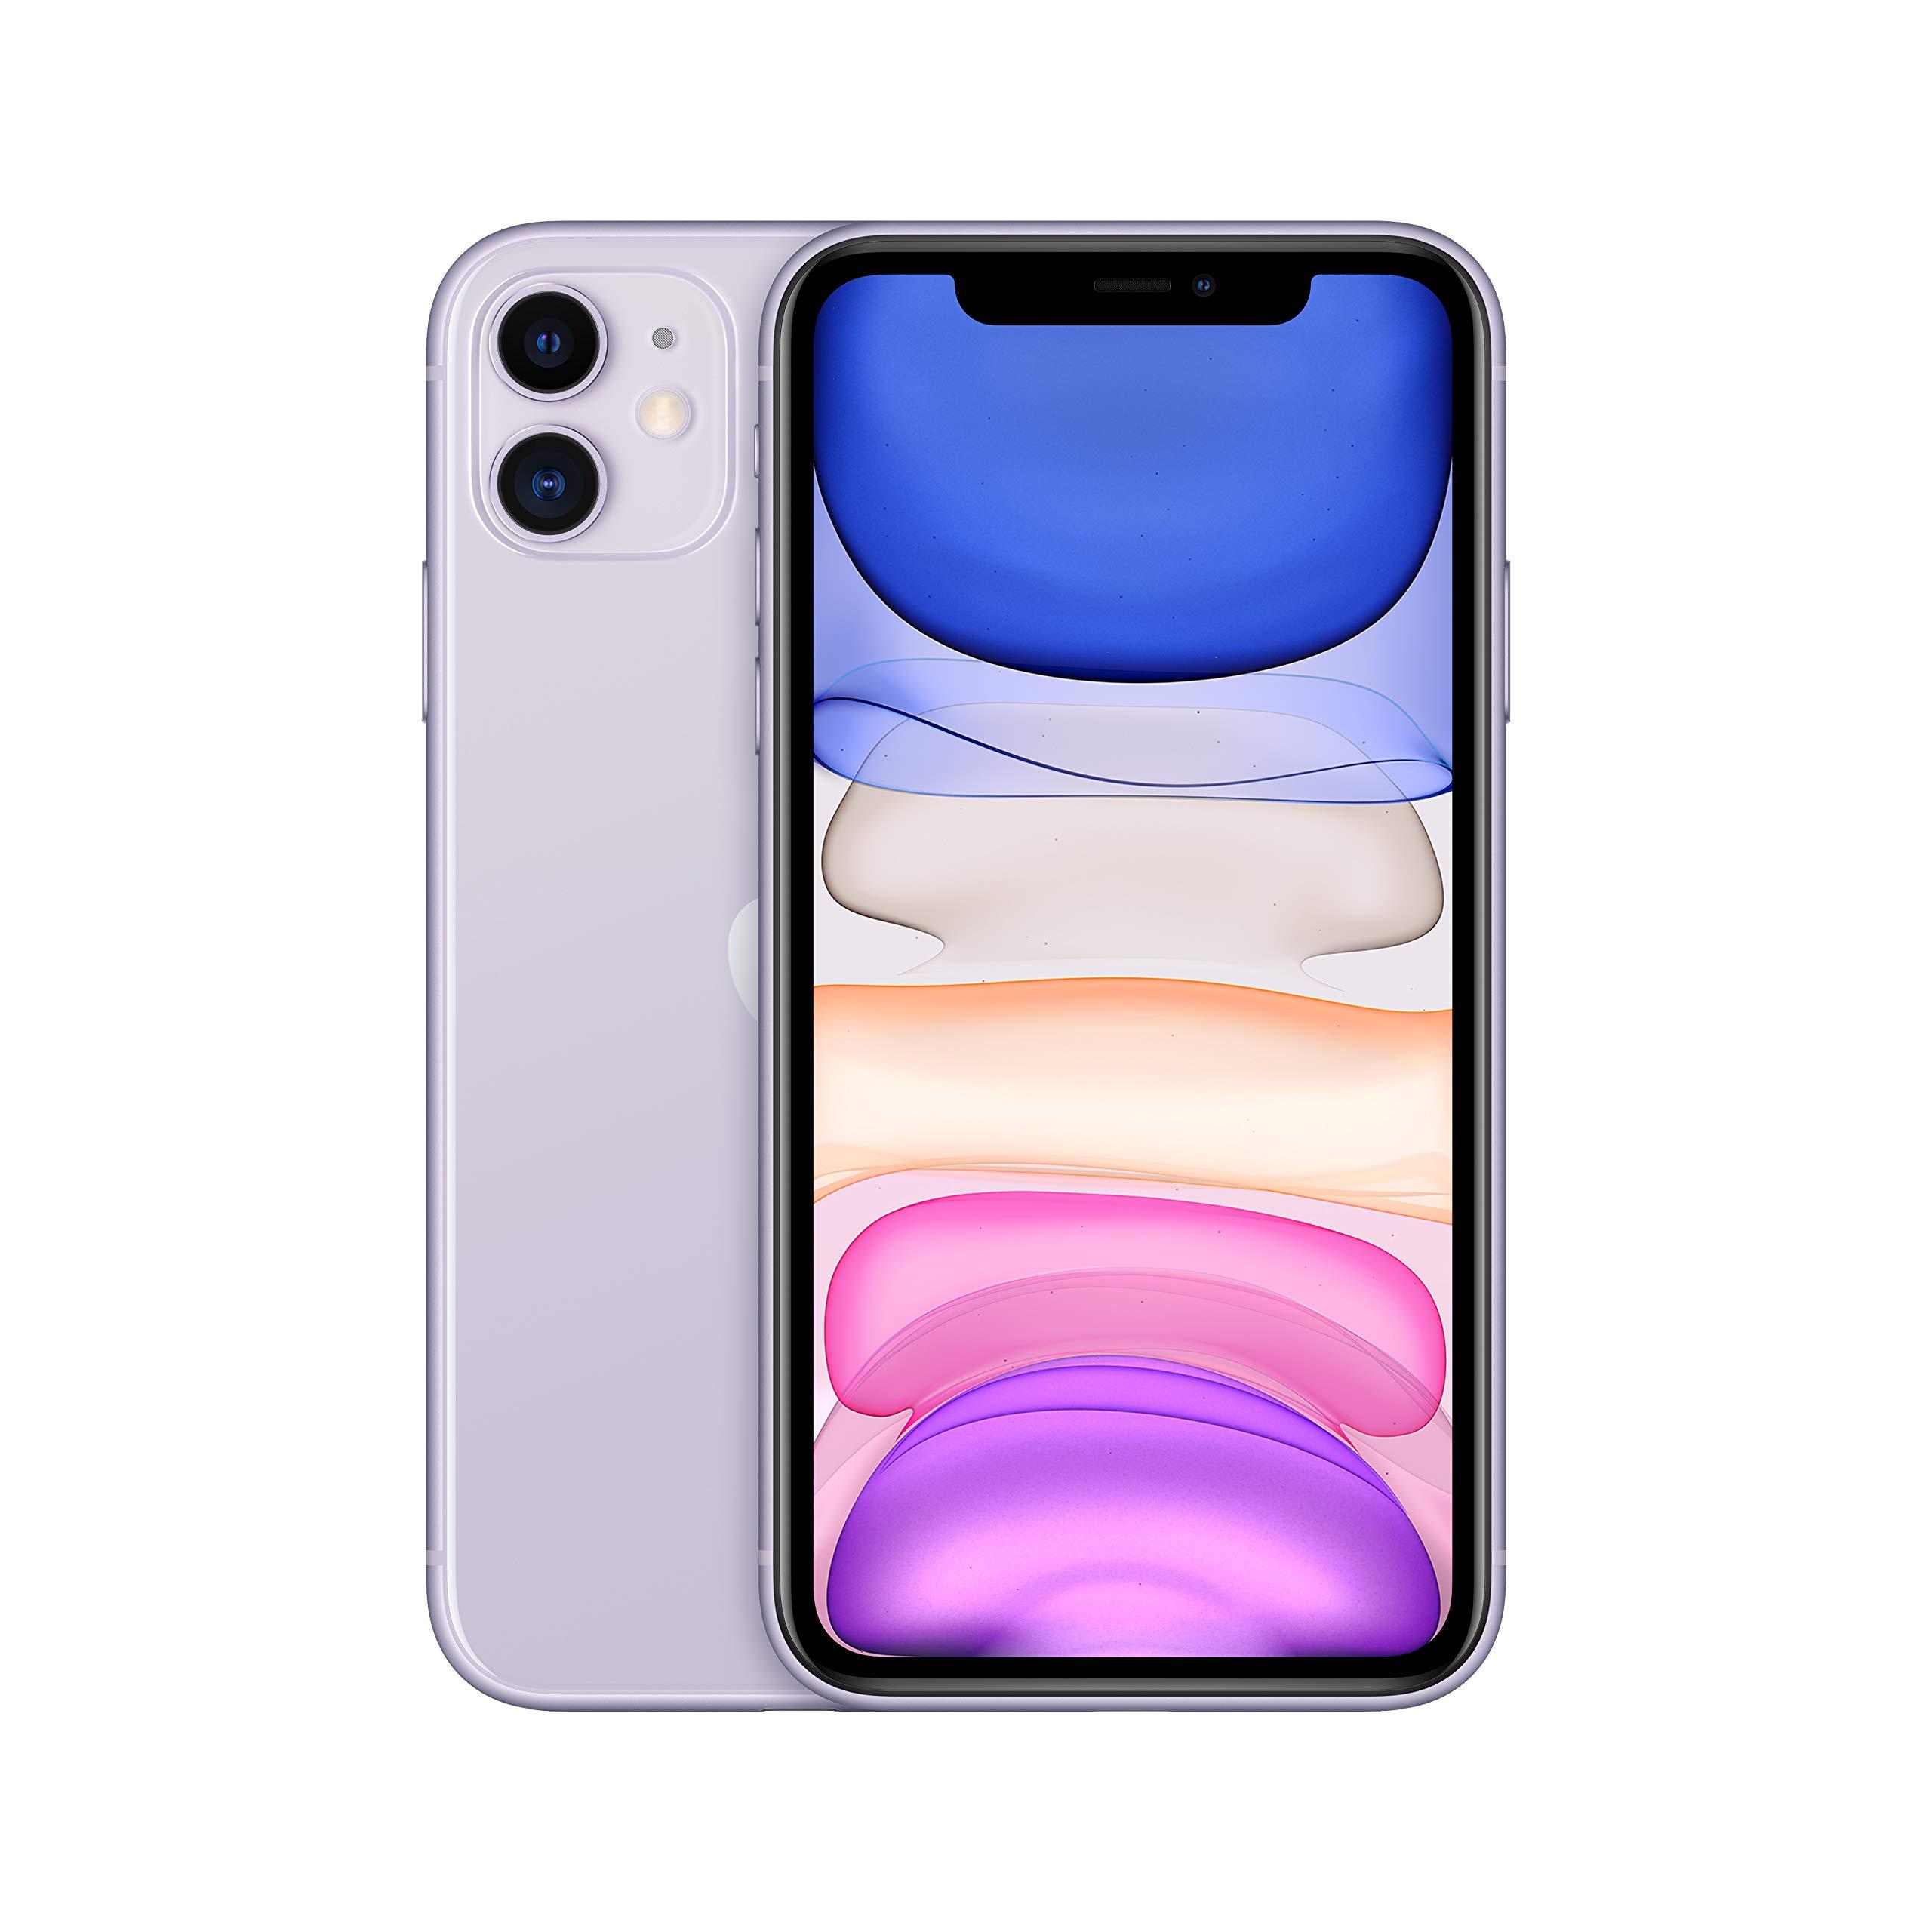 Apple iPhone 11 [64GB, Purple] + Carrier Subscription [Cricket Wireless]